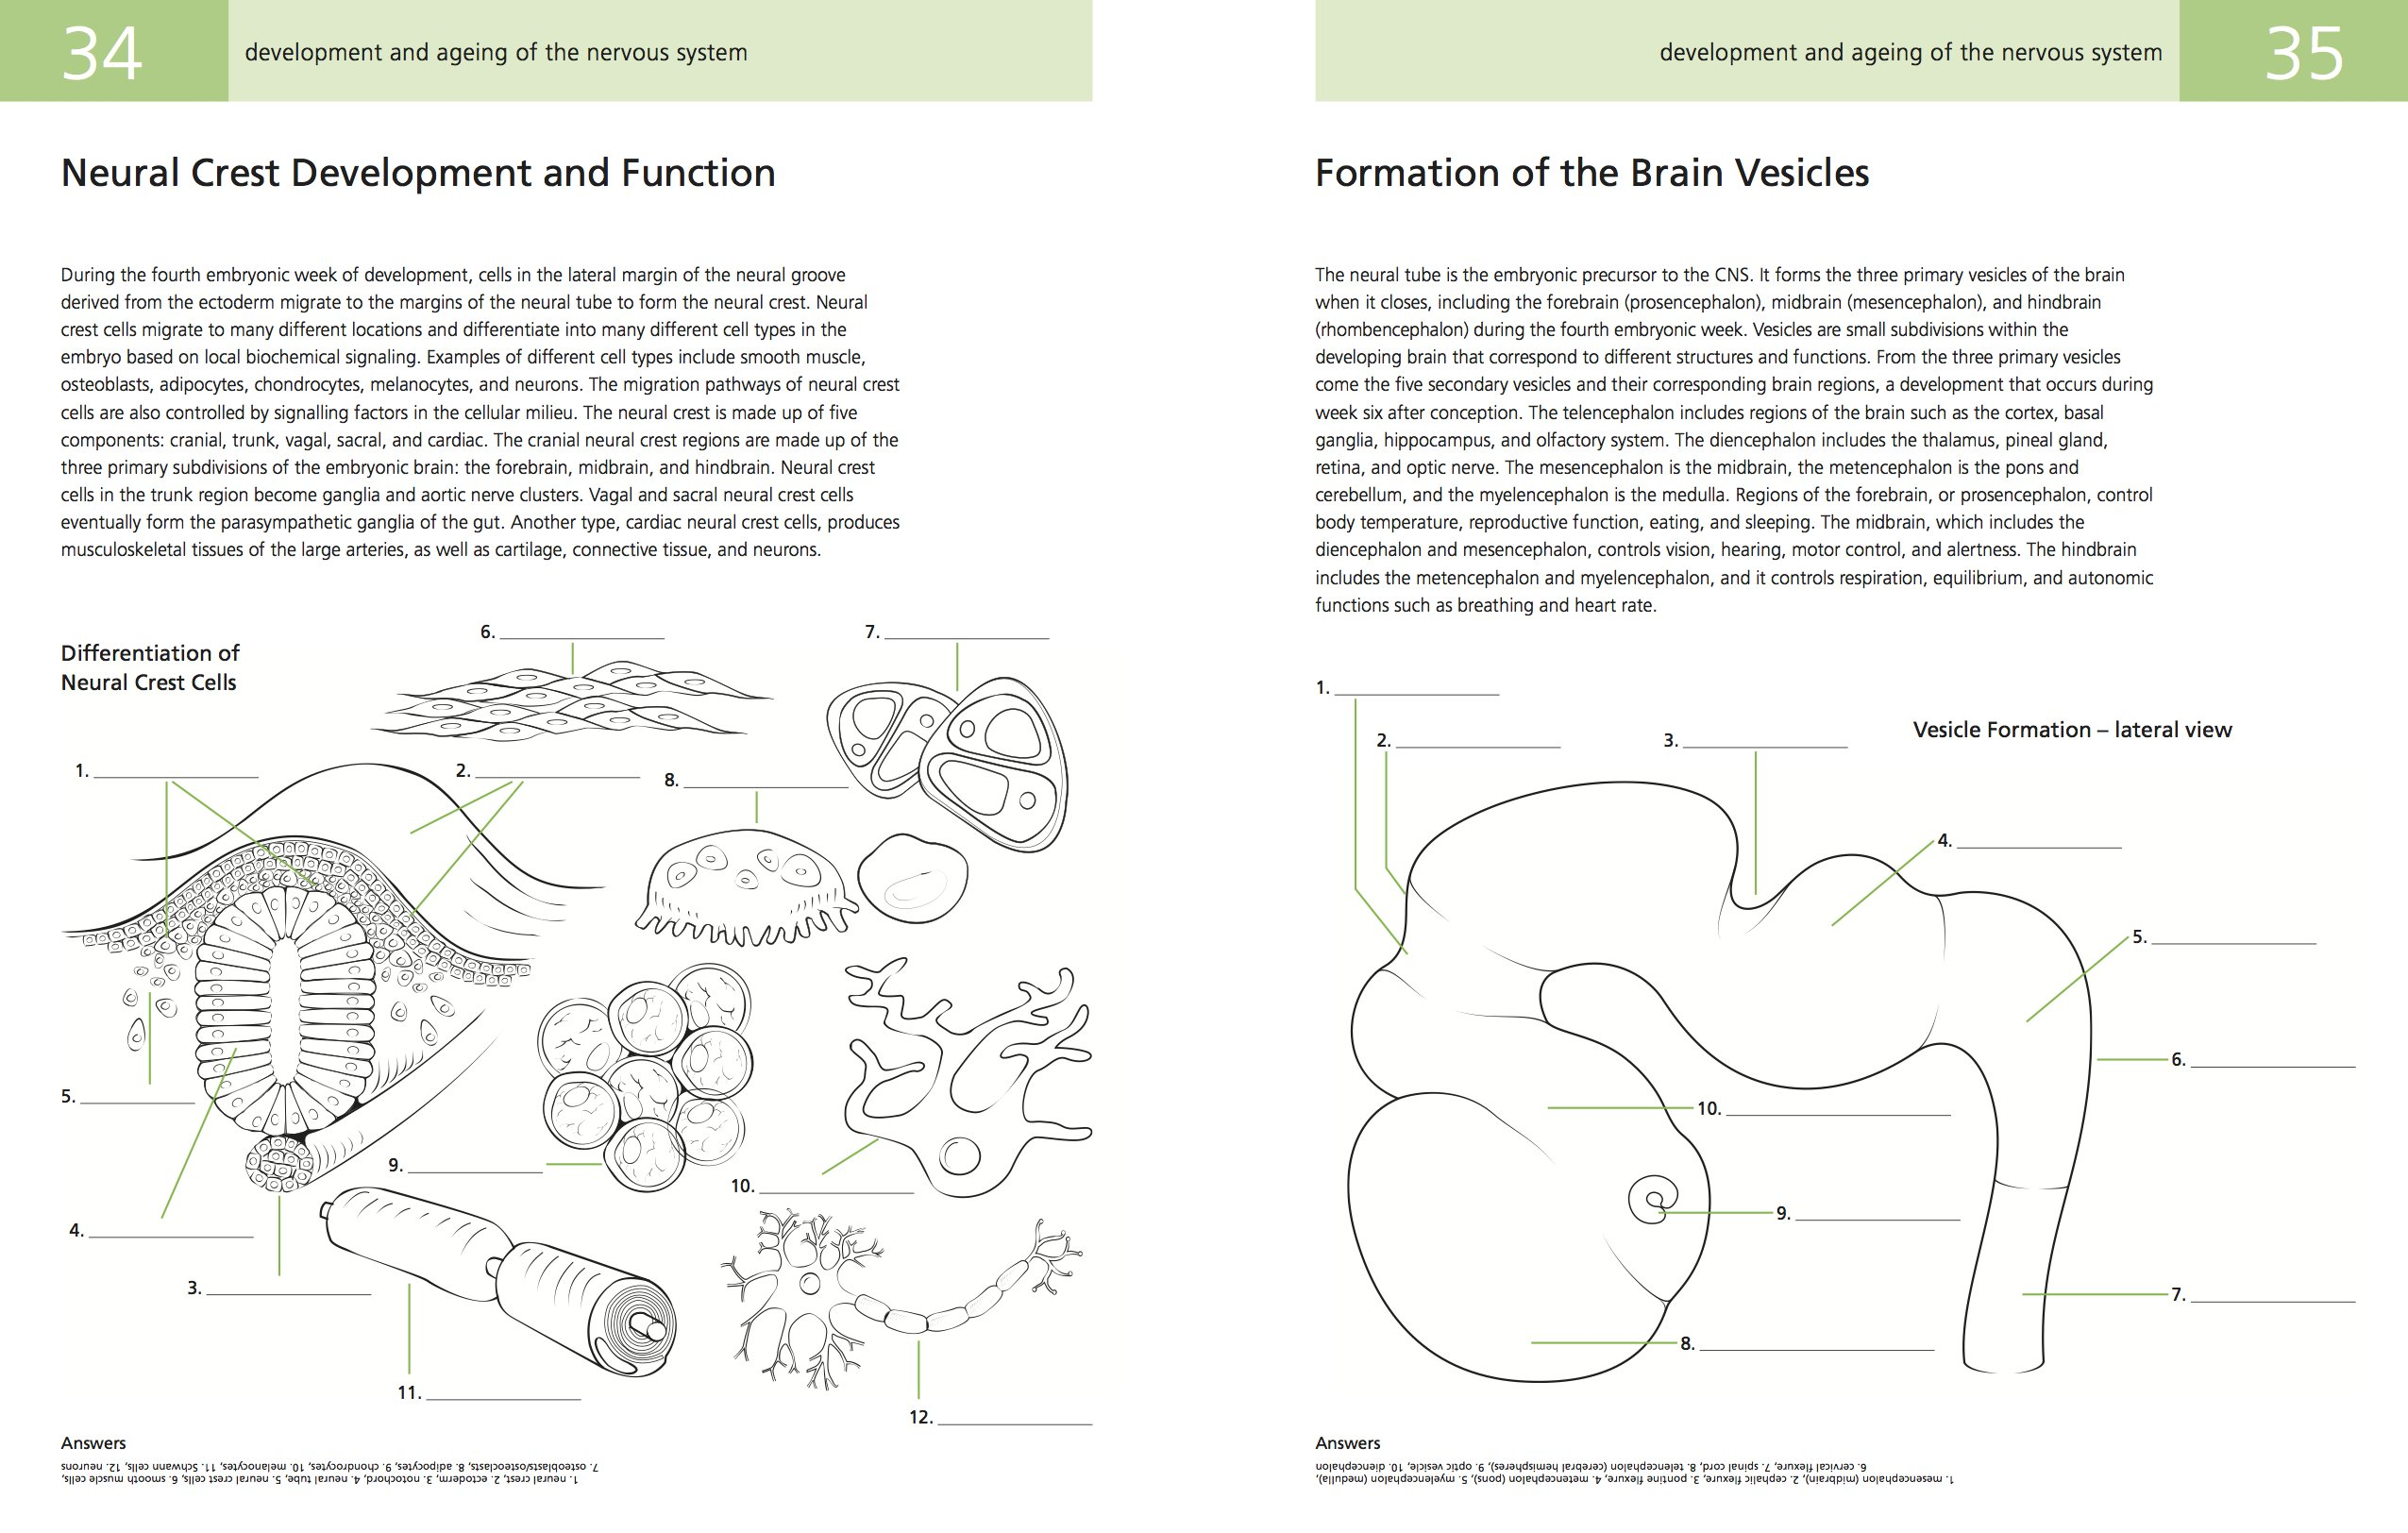 The human brain coloring book diamond - The Brain A Student S Self Test Colouring Book Amazon Co Uk Joshua Gowin Wade Kothmann 9780857624635 Books